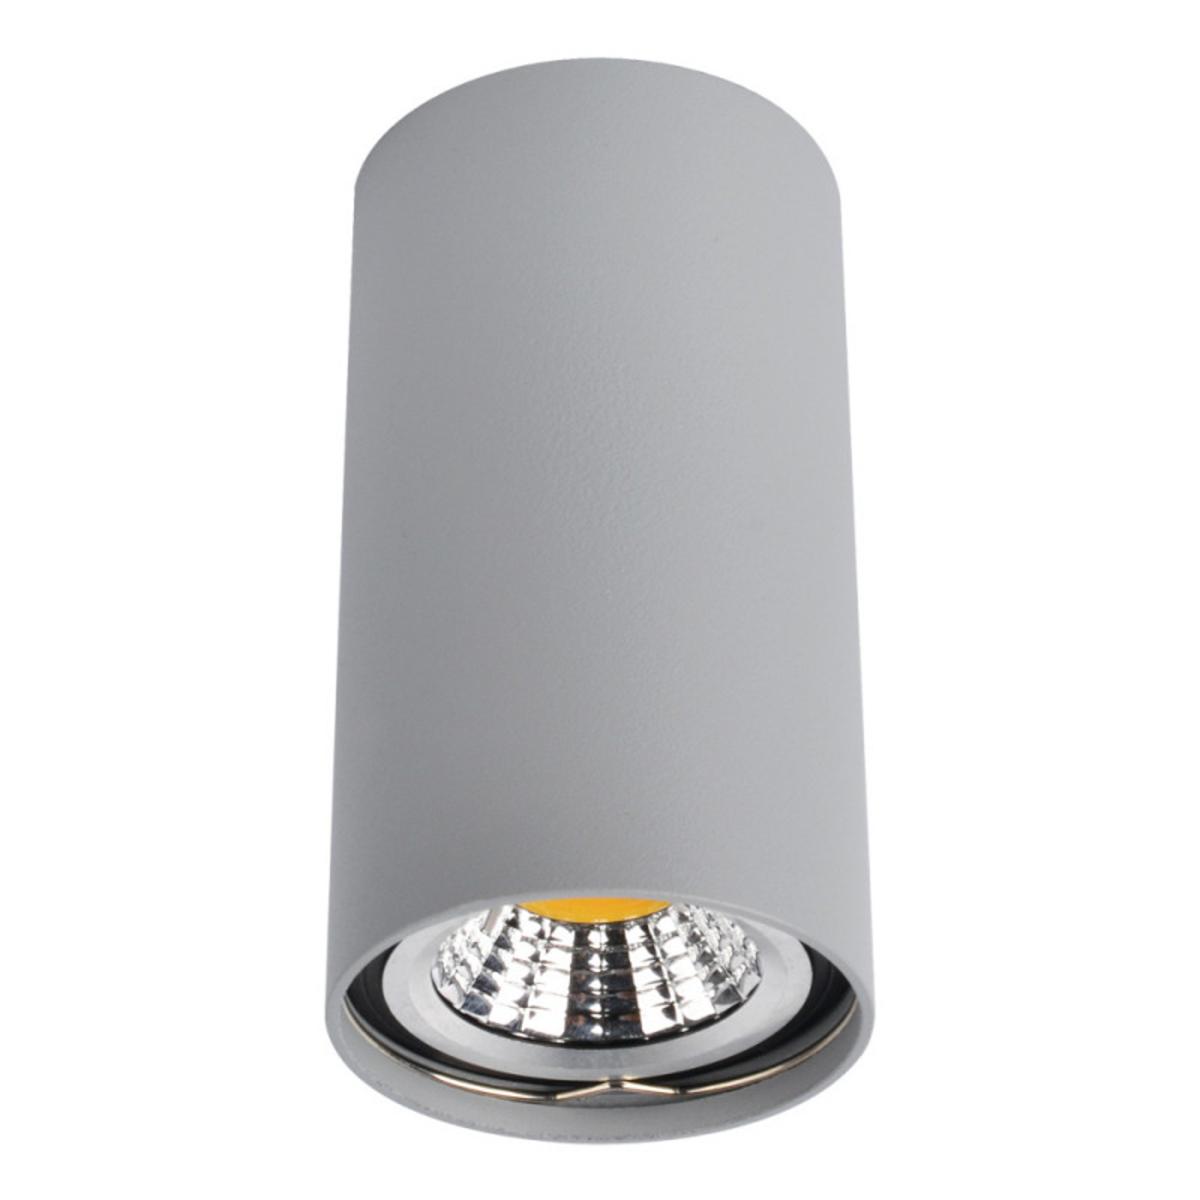 Купить Накладной светильник UNIX Накладной светильник ARTE Lamp A1516PL-1GY (14724), HomeMe